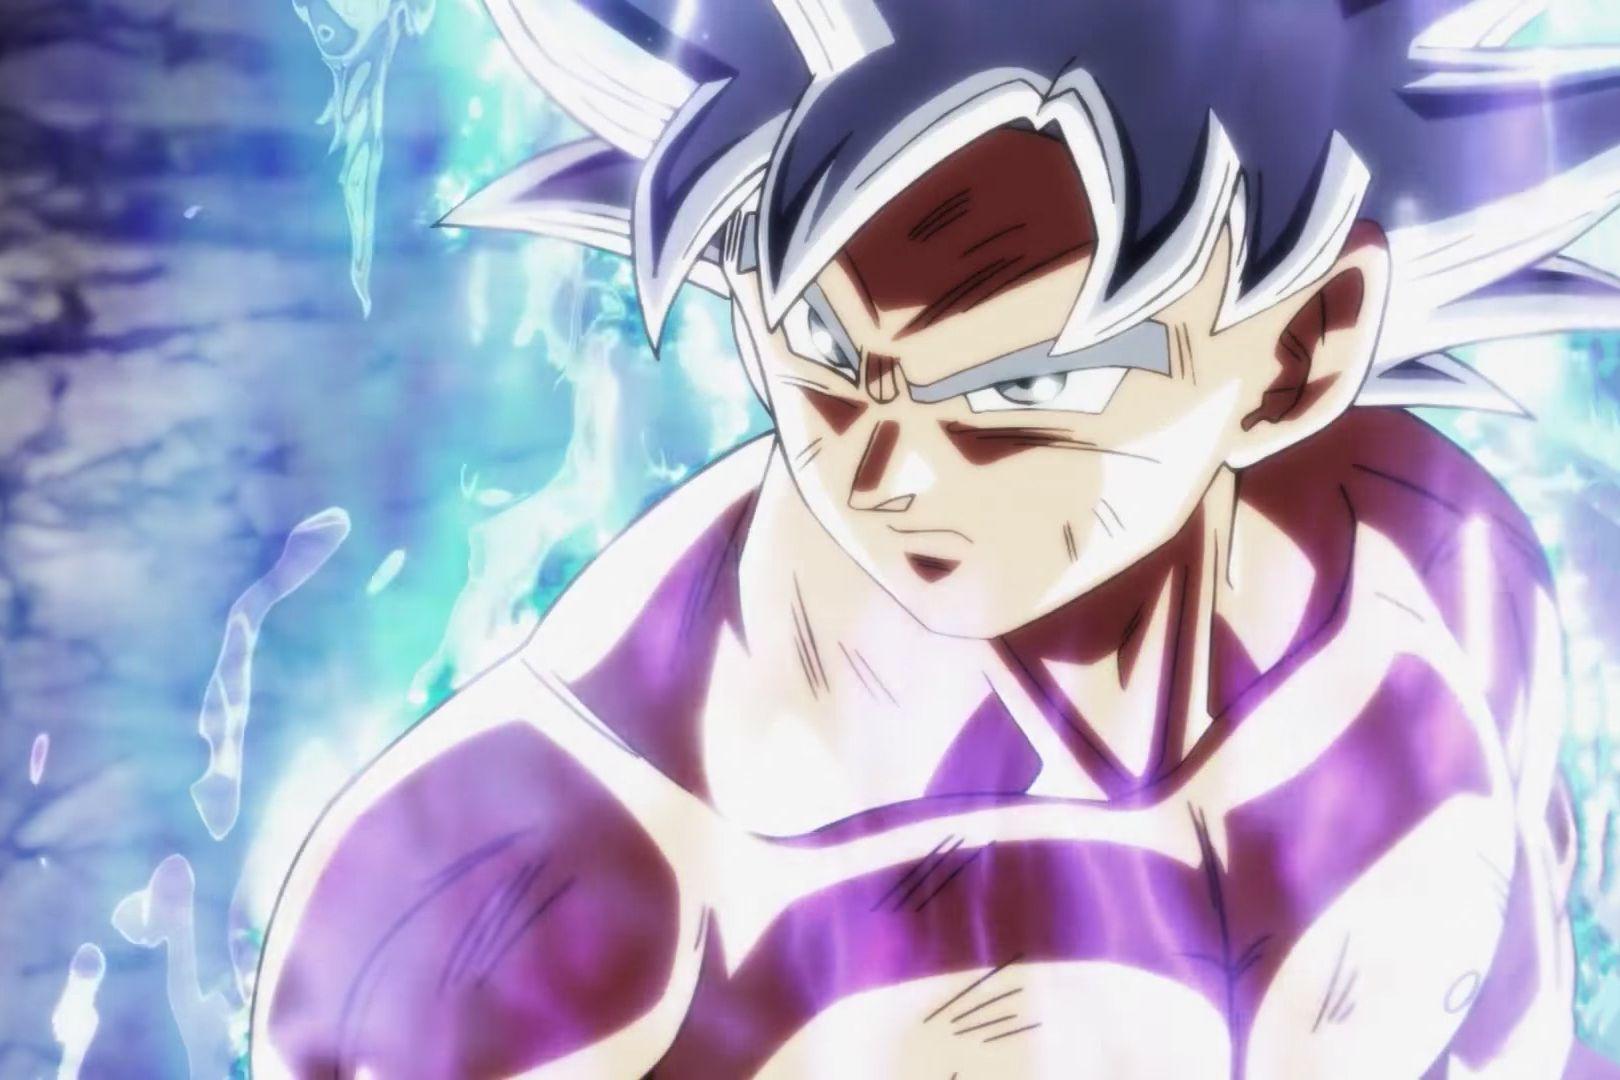 SPOILER ALERT: Goku & Jiren's Battle in 'Dragon Ball Super' Has Been  Decided | Dragon ball super goku, Anime, Dragon ball super wallpapers